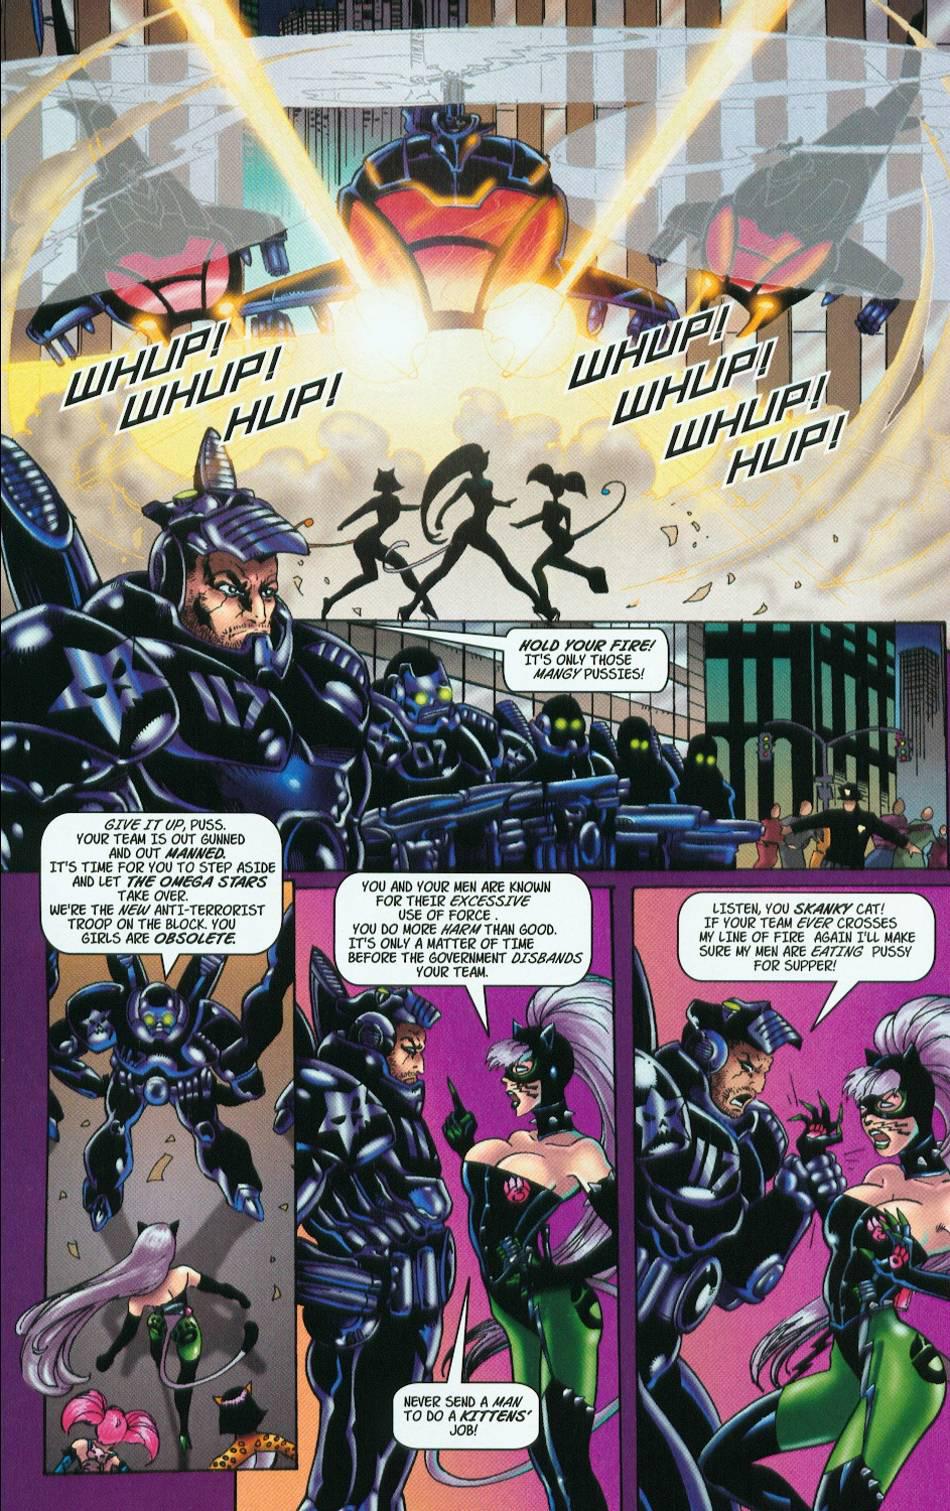 Read online 3 Little Kittens: Purrr-fect Weapons comic -  Issue #1 - 20